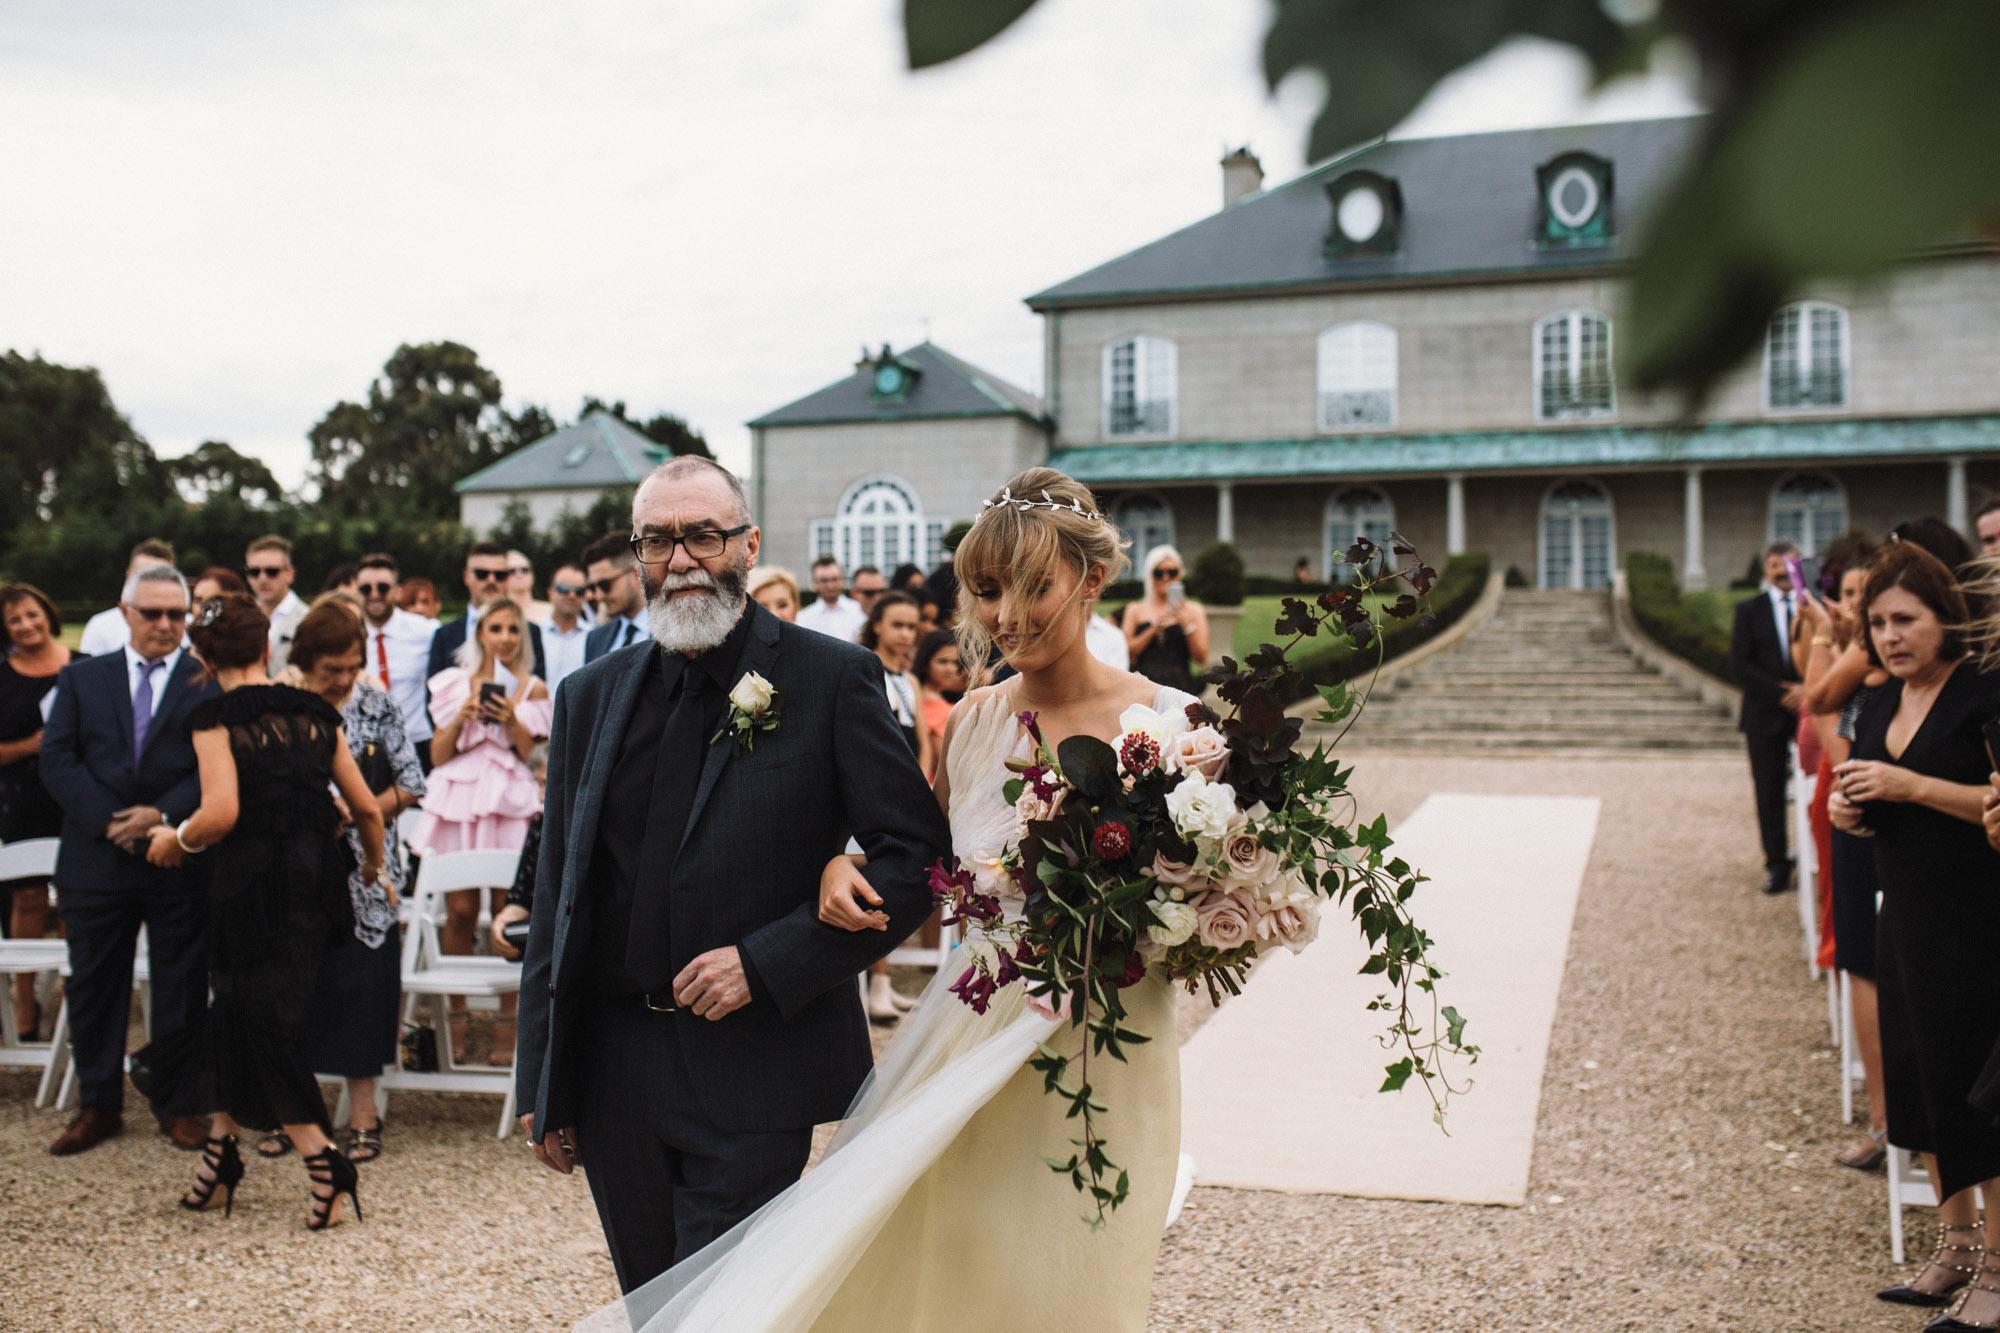 Campbell Point House Wedding HJ + Dean Raphael Weddings-74.jpg